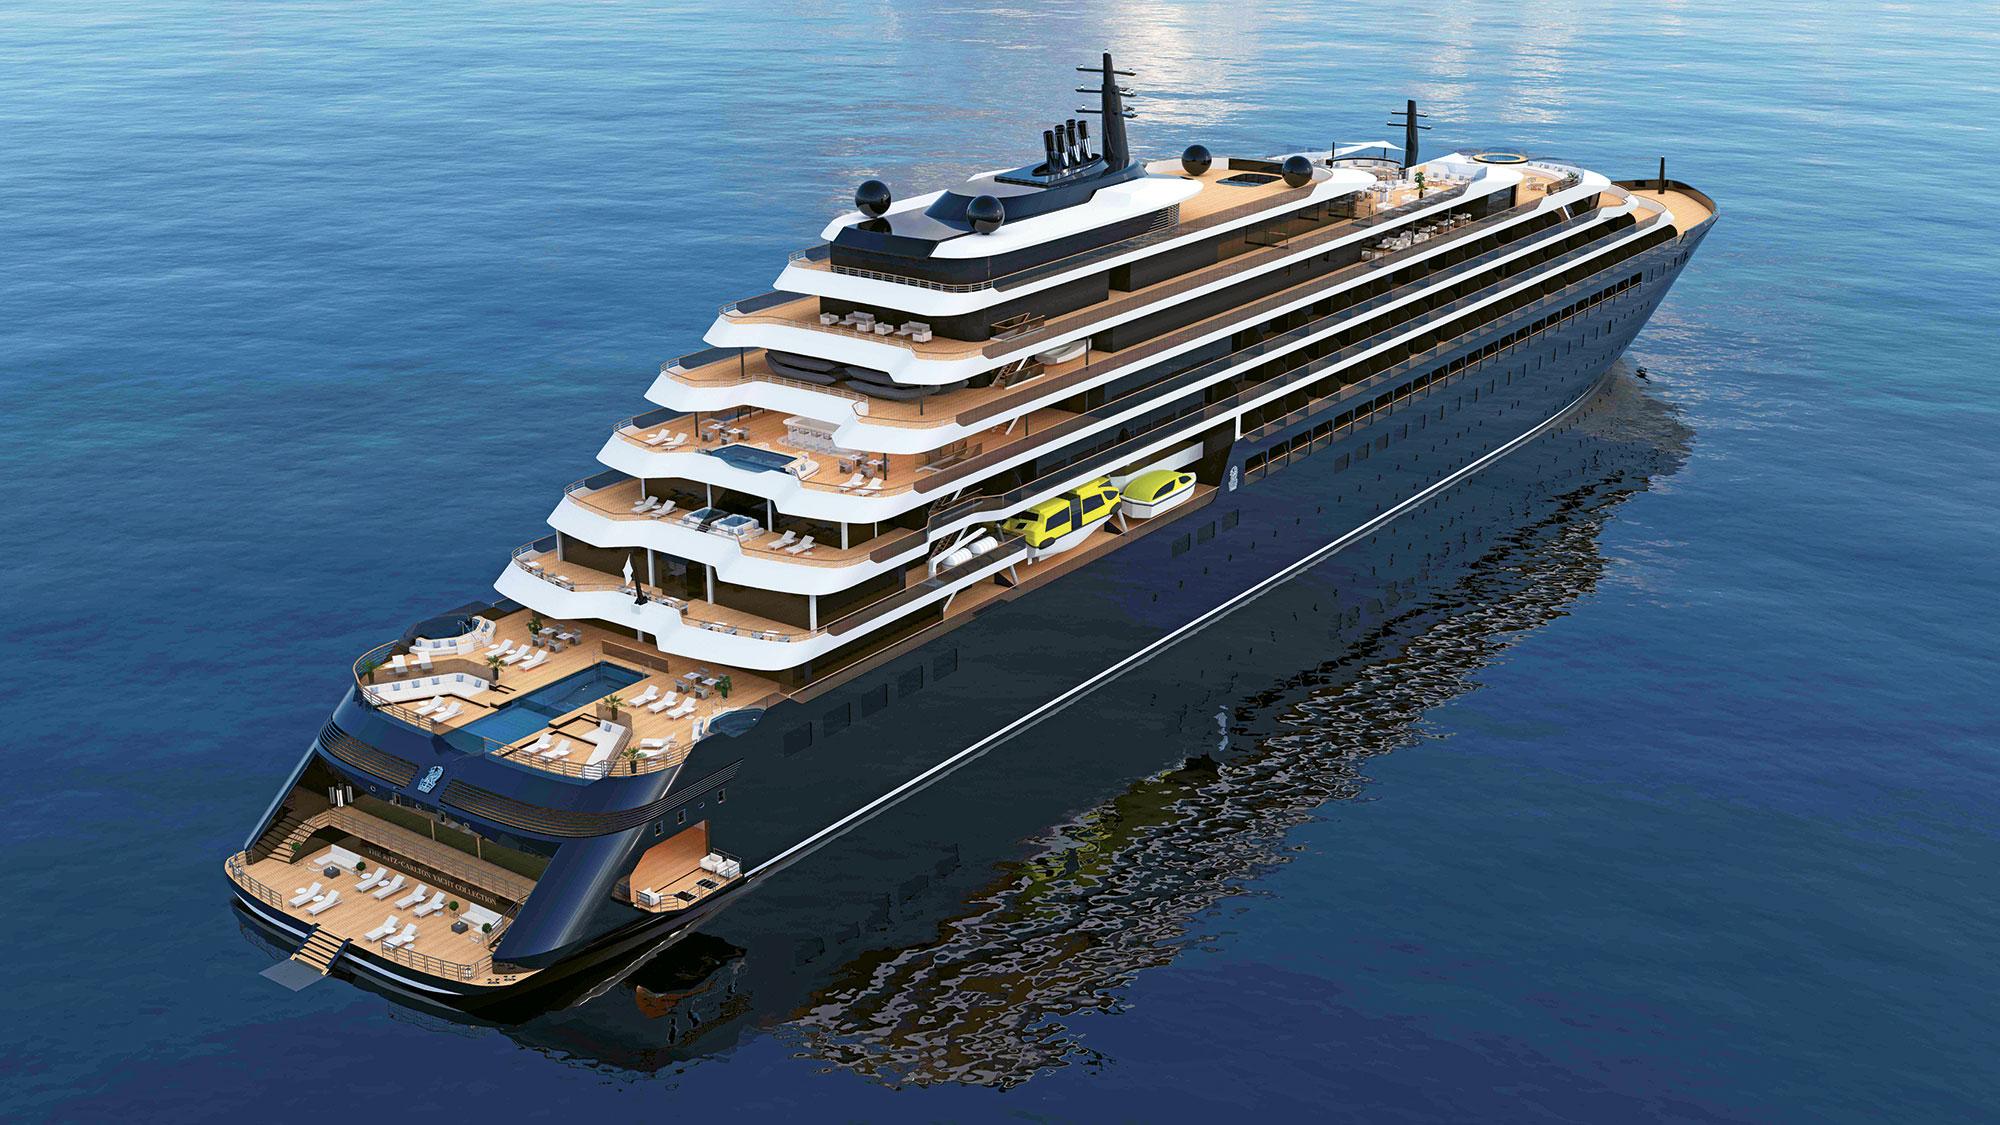 ritz carlton yacht cruise prices